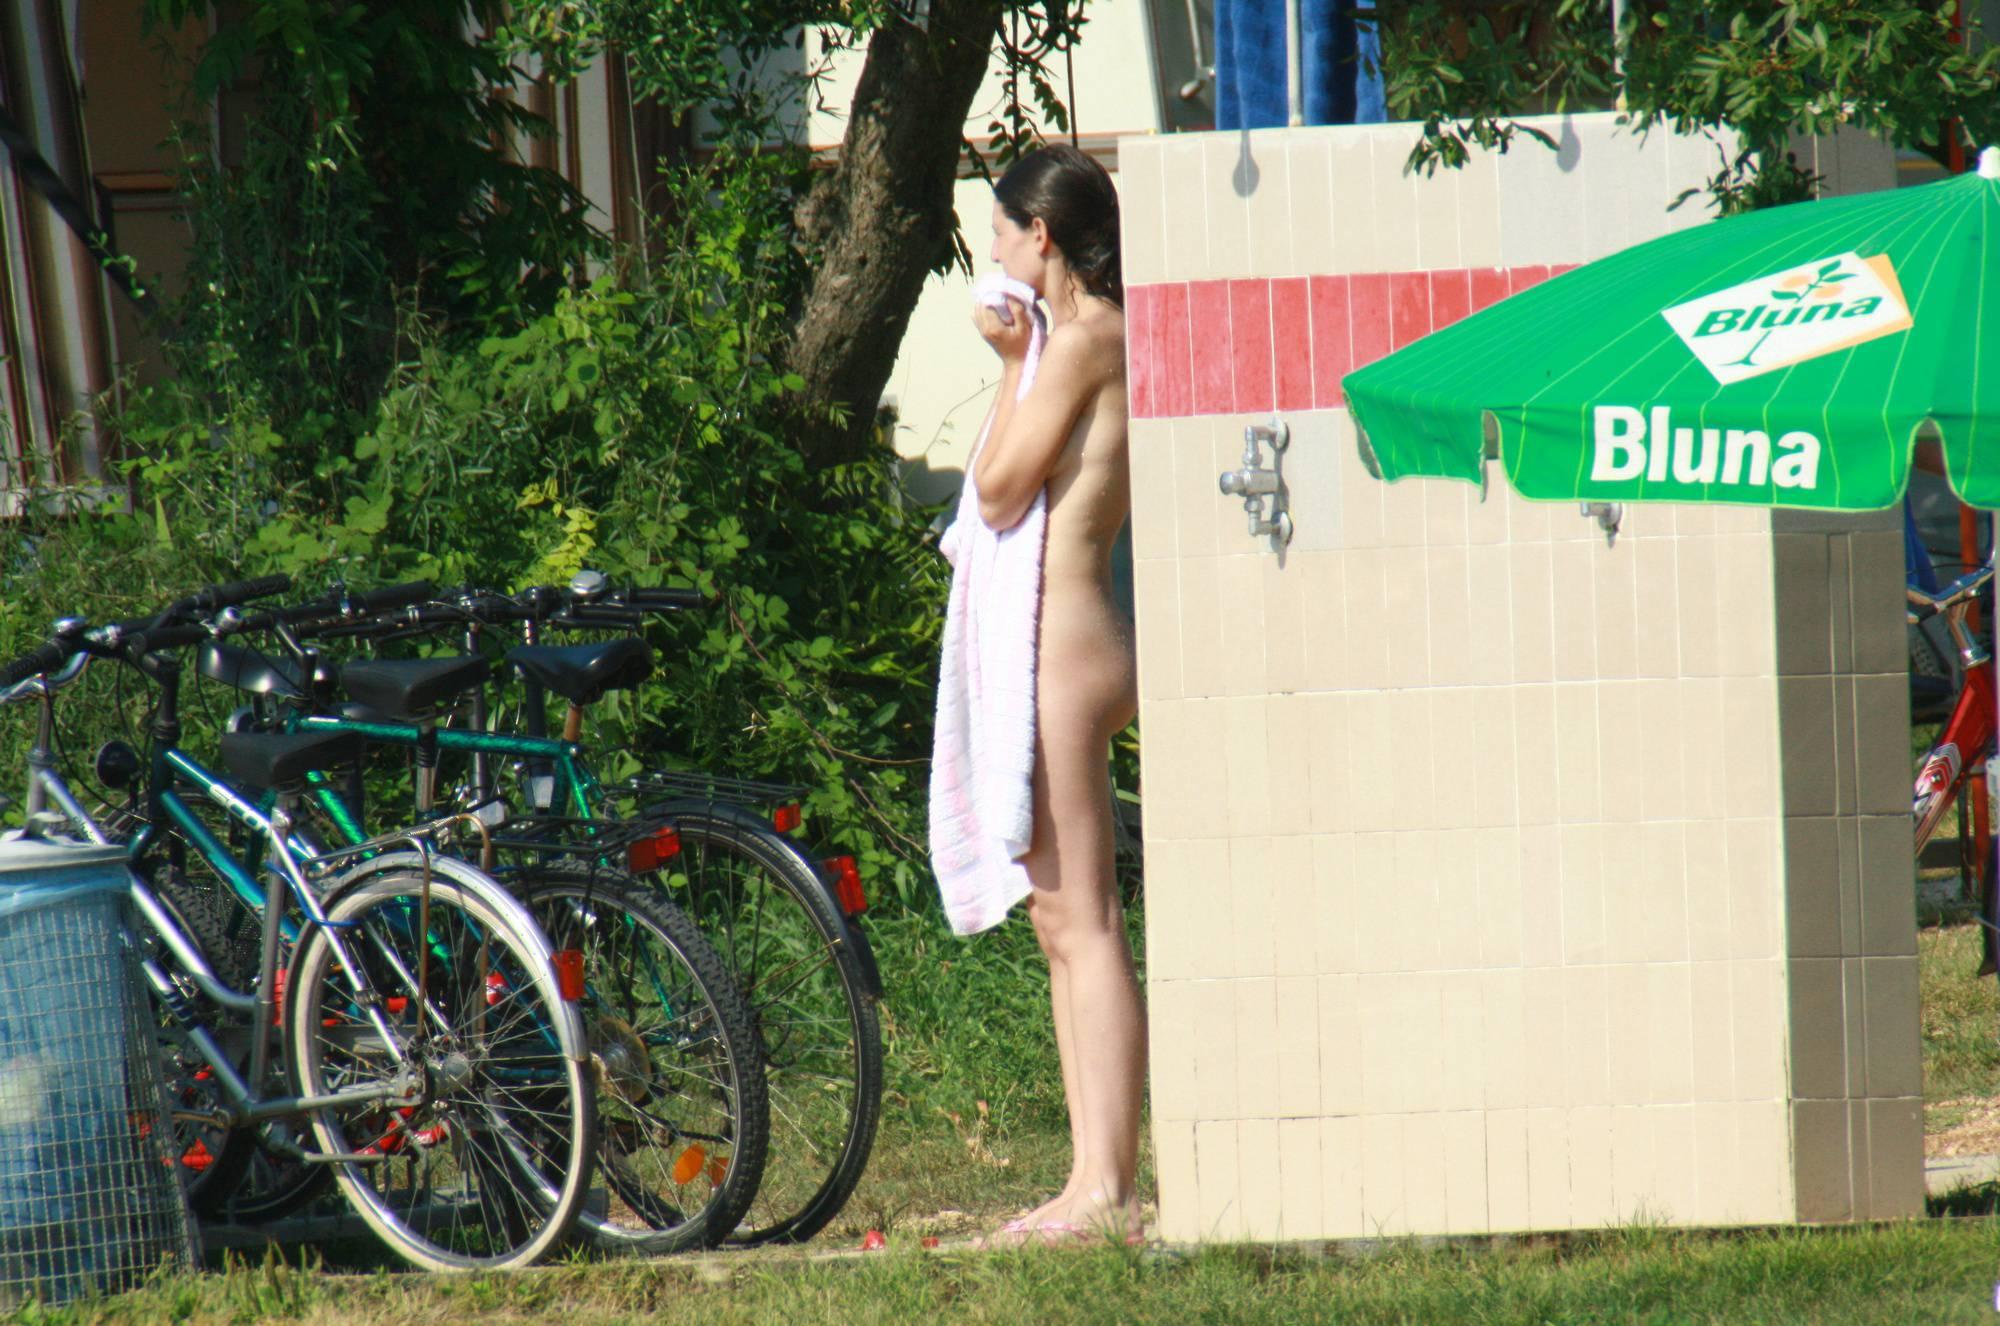 Nudist Photos Nudist Romantic Outdoors - 2